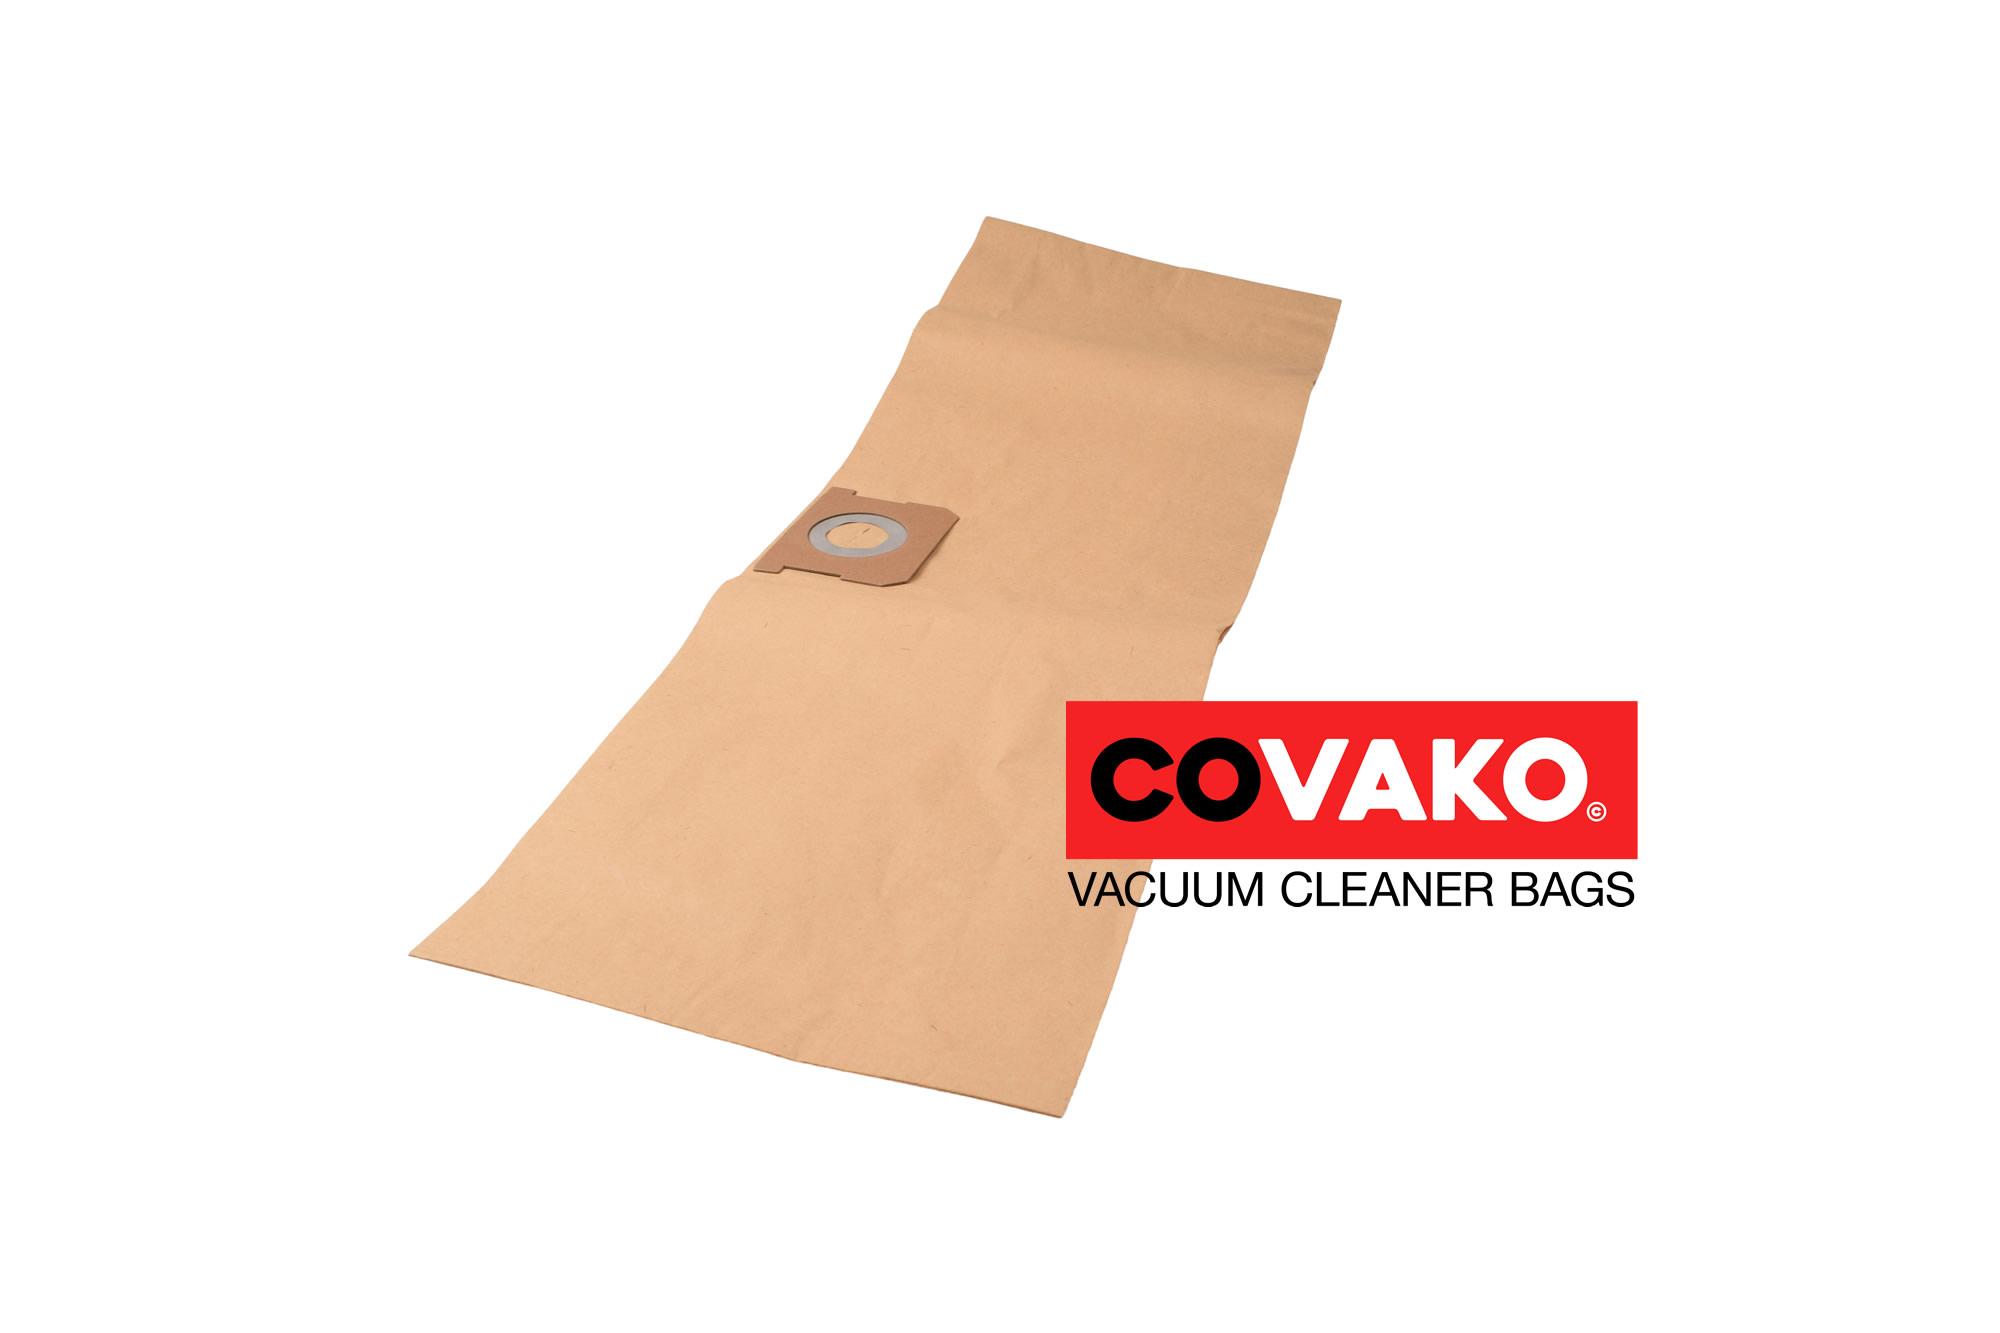 Bauhaus Shop Vac Pro 25 / Papier - Bauhaus stofzuigerzakken